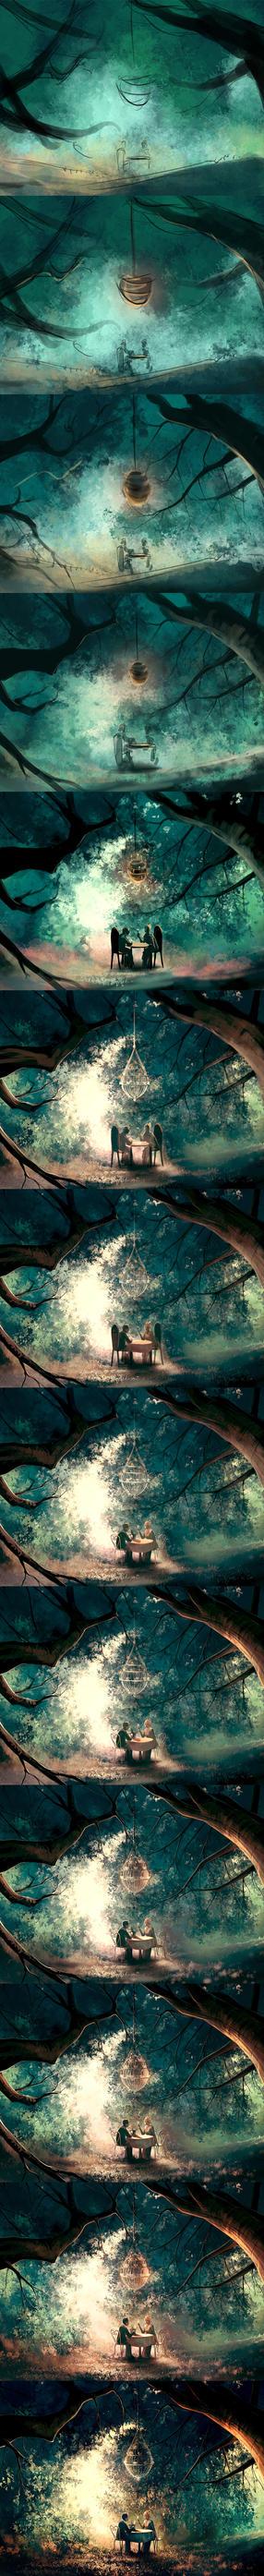 WIP of Honeymoon by AquaSixio